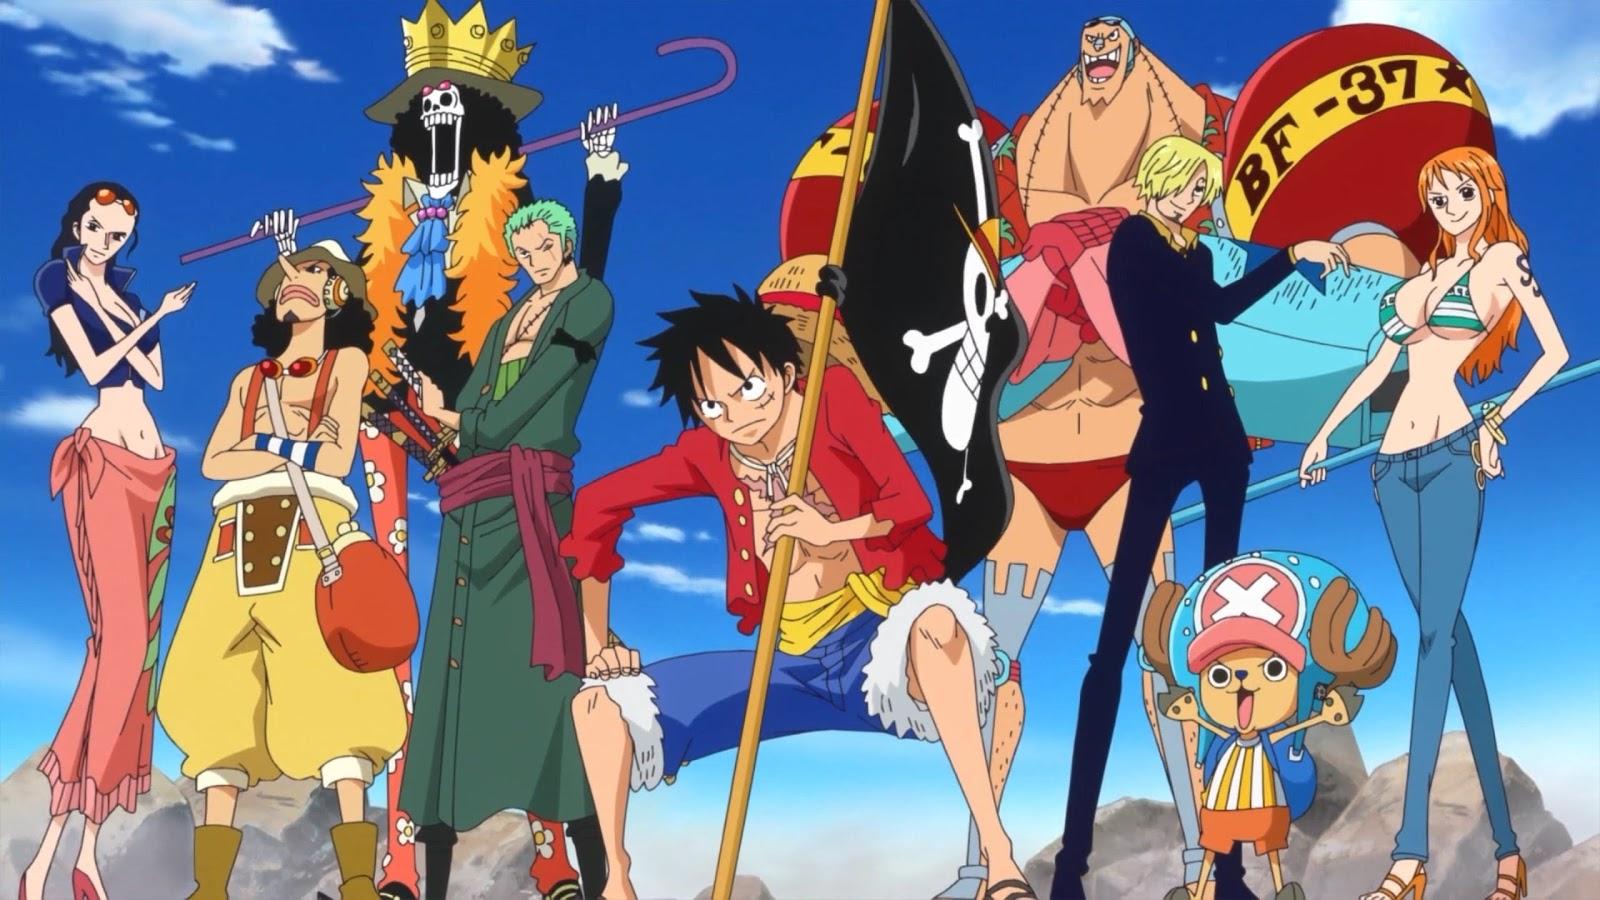 Daftar Anggota Bajak Laut Topi Jerami One Piece Infoakurat Com